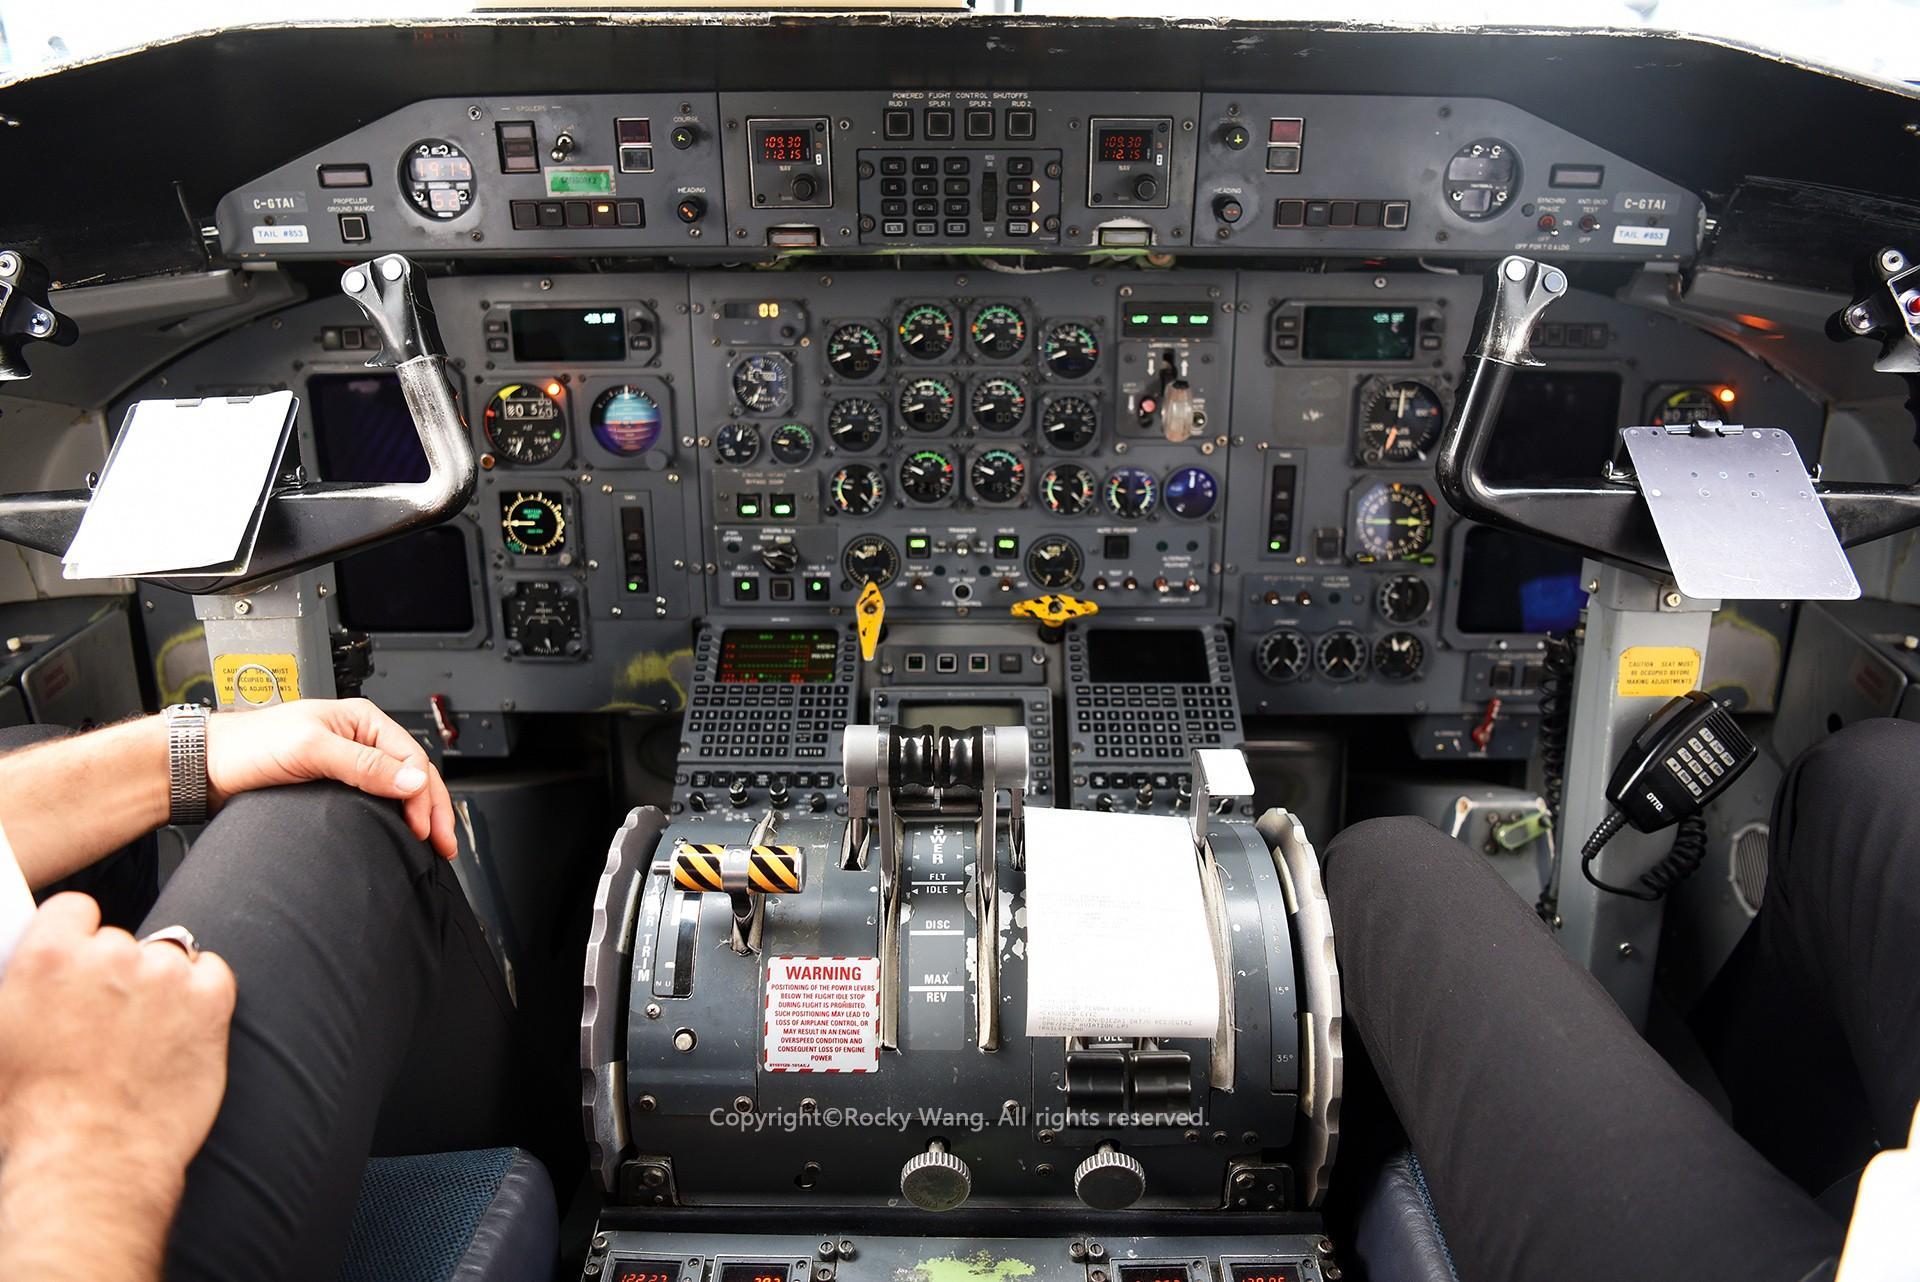 Re:[原创]简易版游记,纪念一次30段的环球飞行和一些碎碎念 BOMBARDIER DASH 8-102 C-GTAI Toronto Lester B. Pearson Int'l Airport